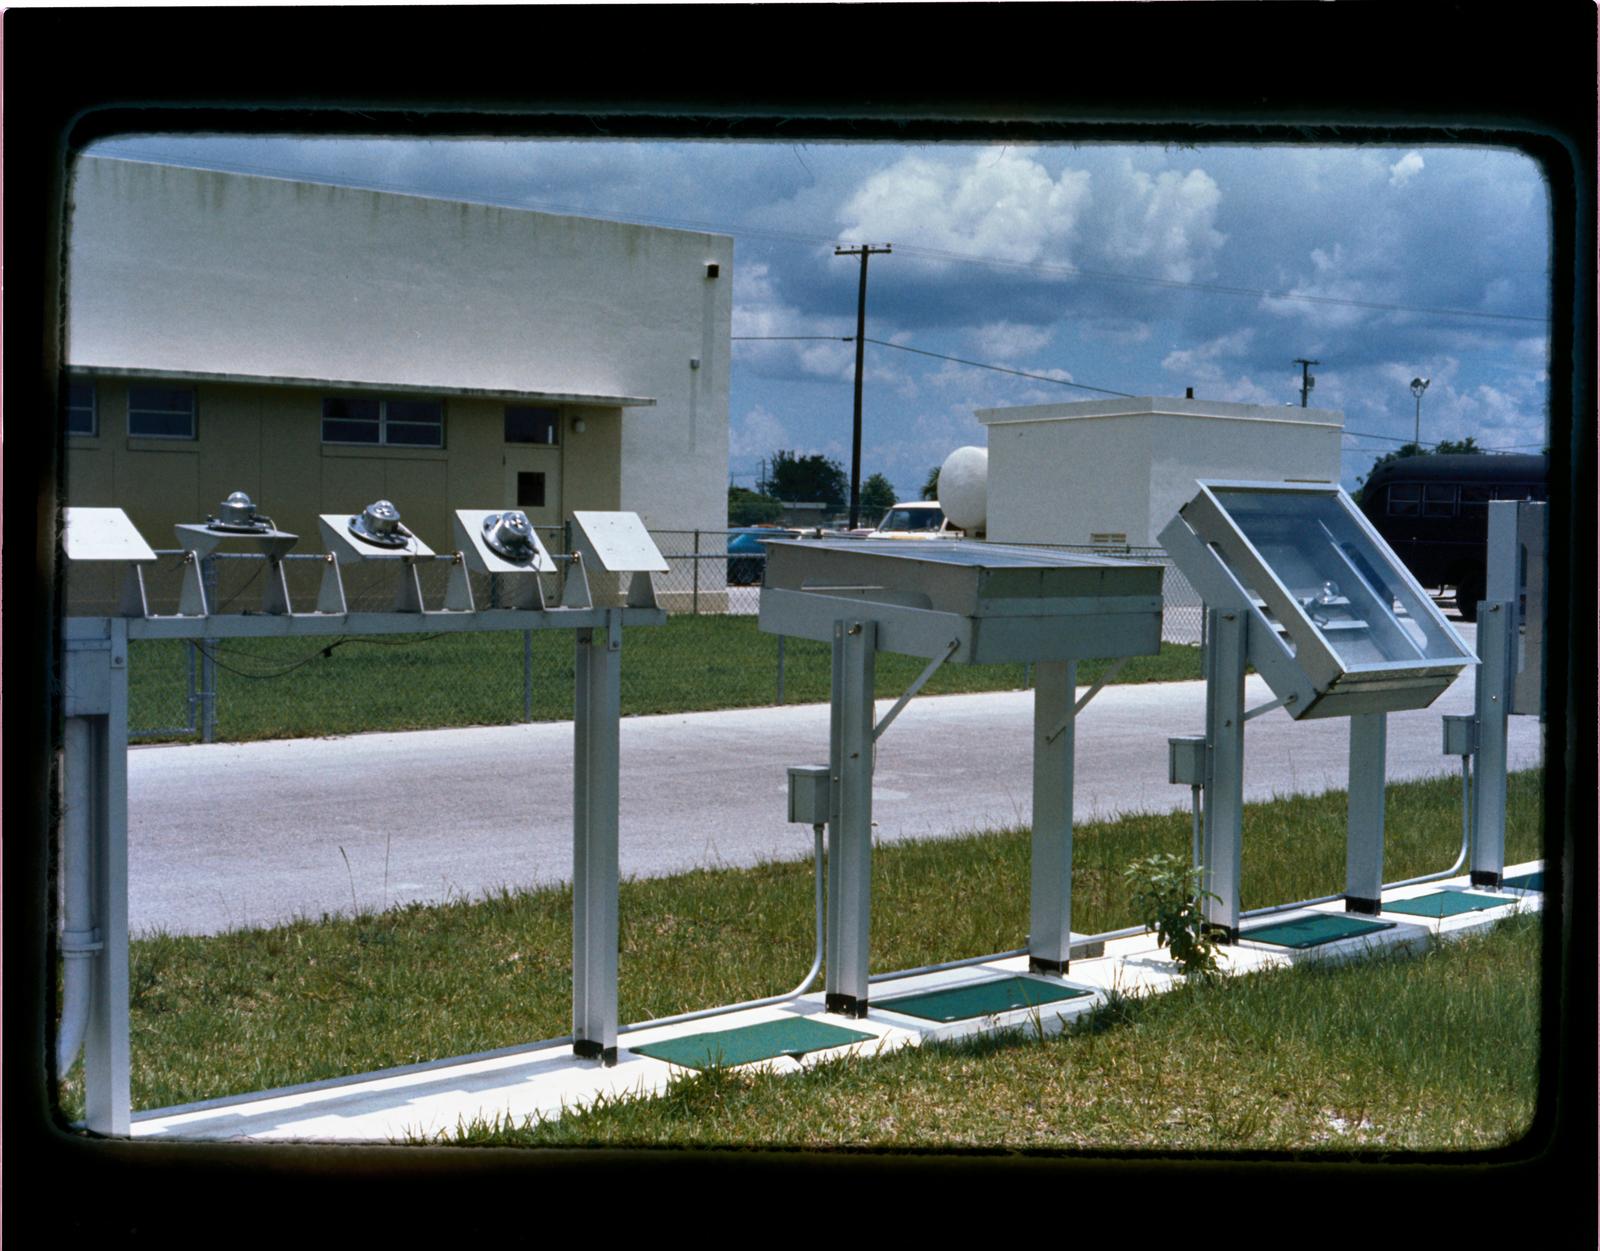 SOLAR MODULE EXPOSURE TESTING AT VARIOUS SITES